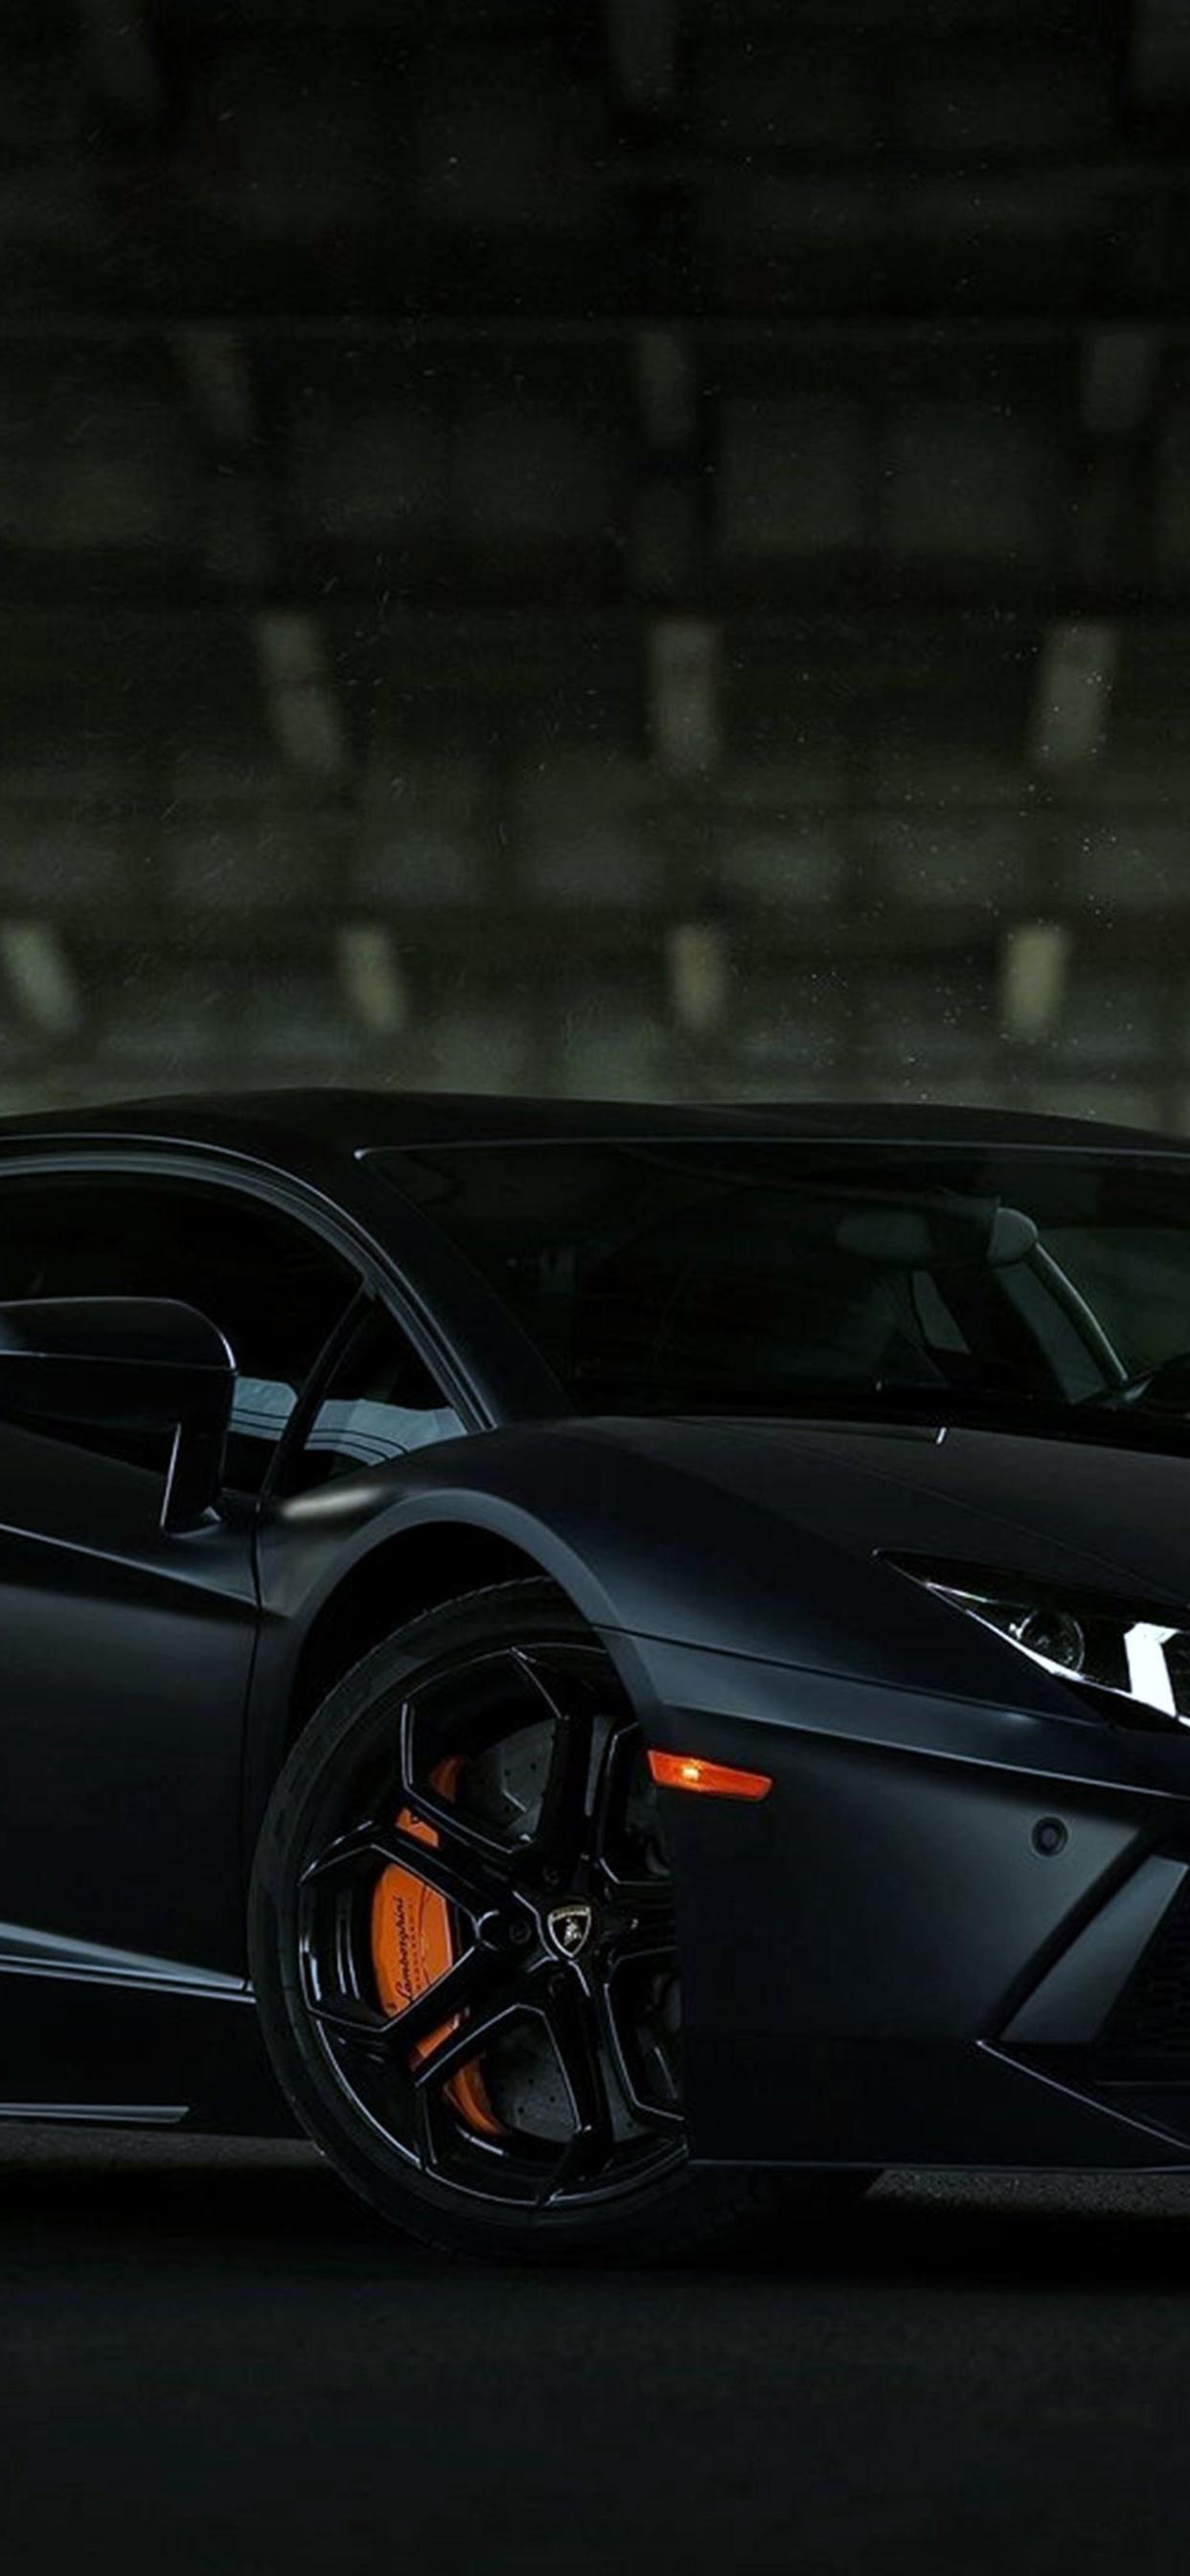 Iphone Xs Max Wallpaper Lamborghini Iphone Xs Max Wallpaper